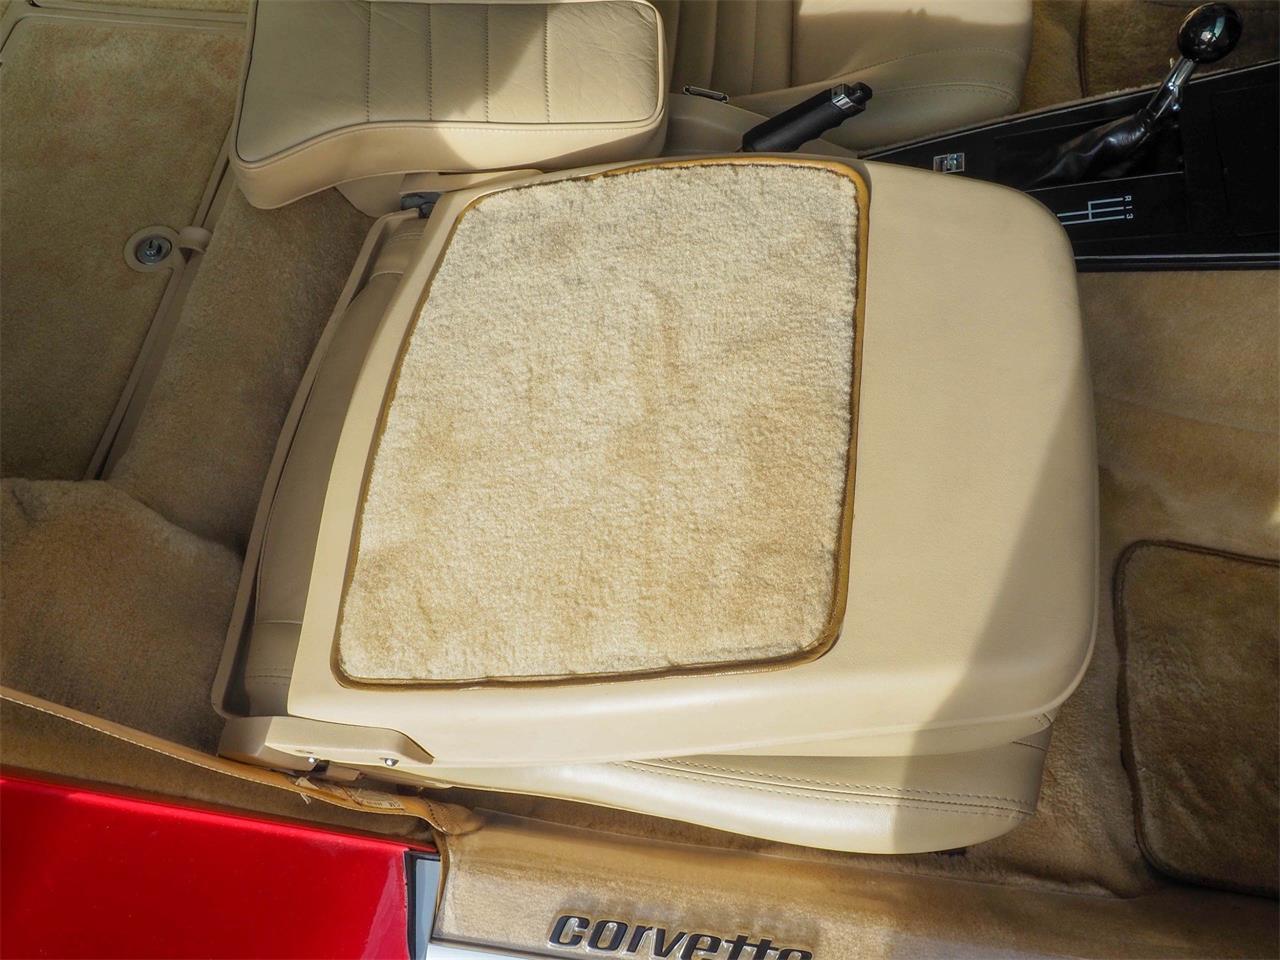 1980 Chevrolet Corvette (CC-1419667) for sale in Englewood, Colorado